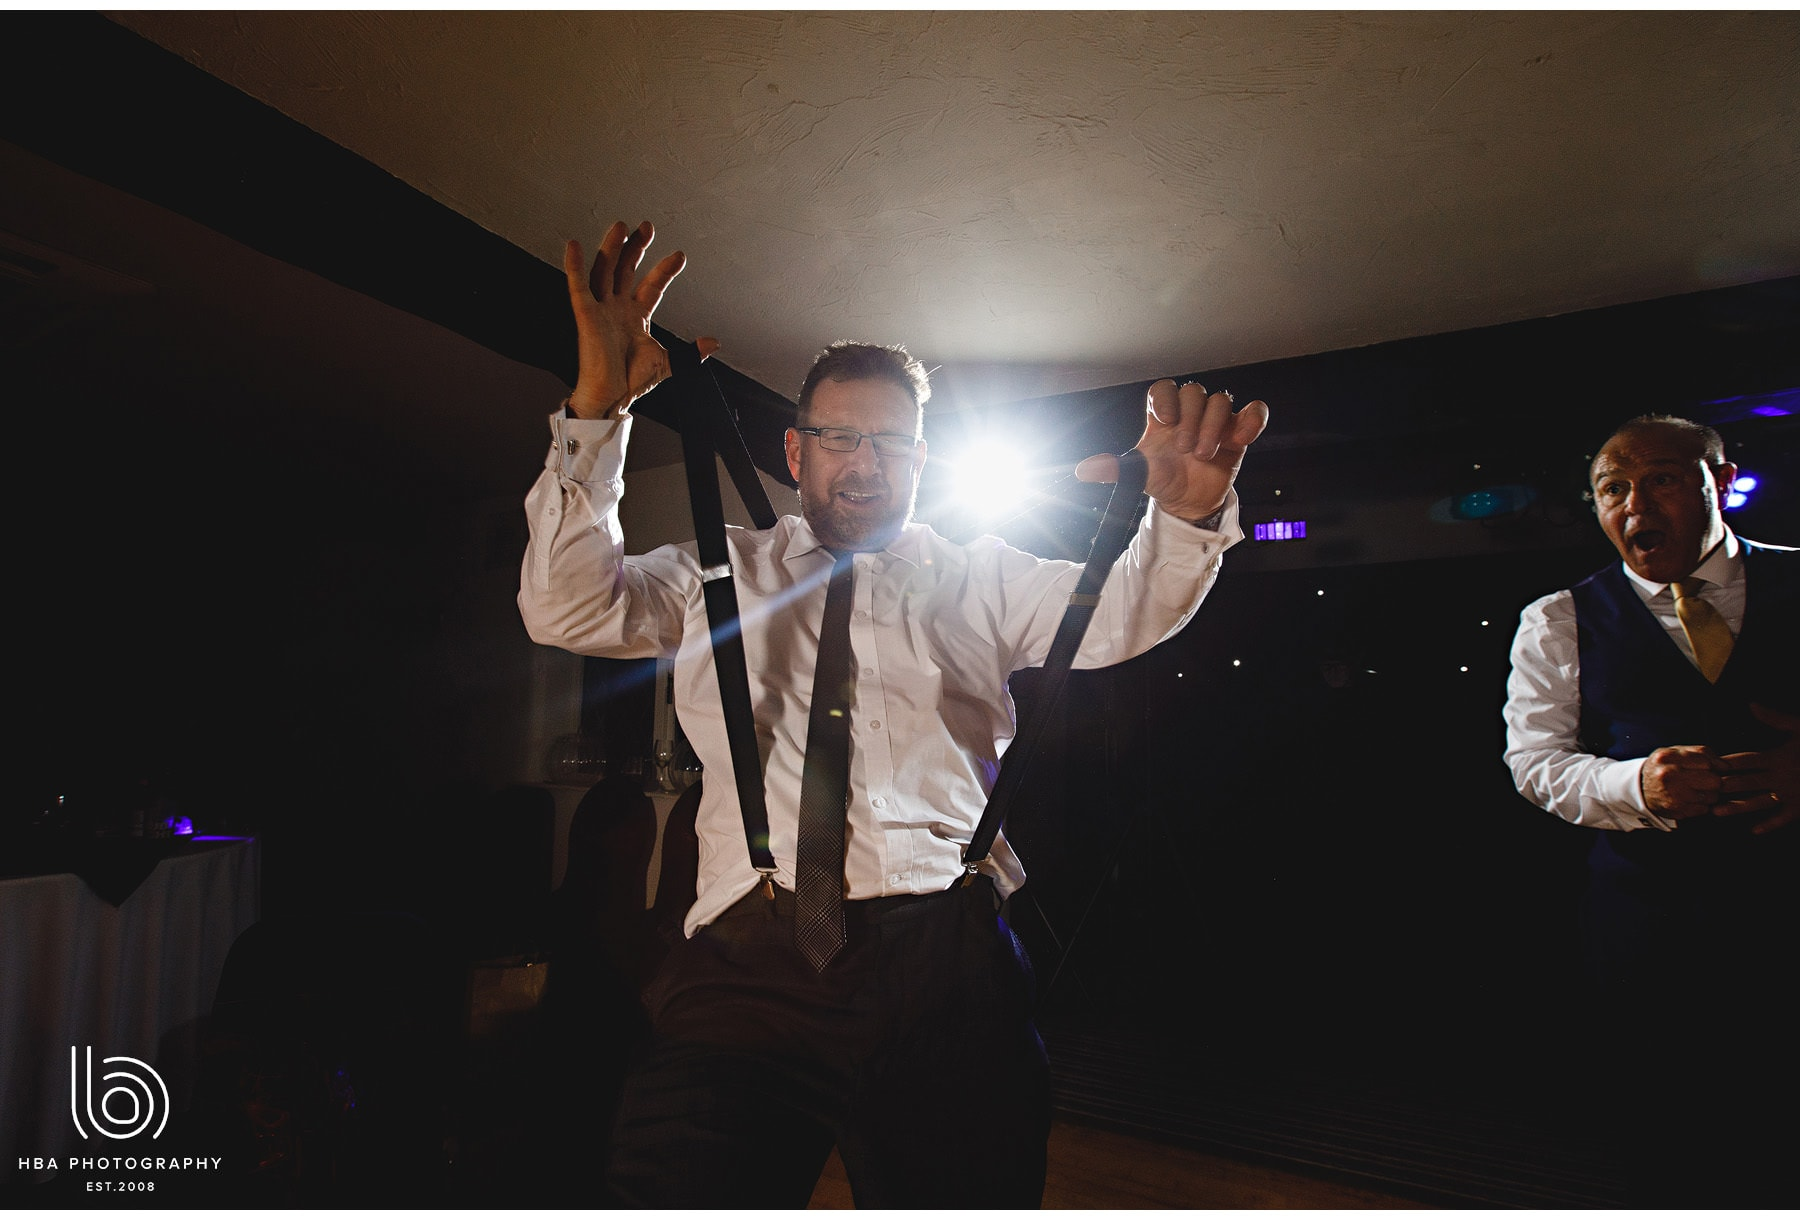 wedding guest pulling his braces as he dances.